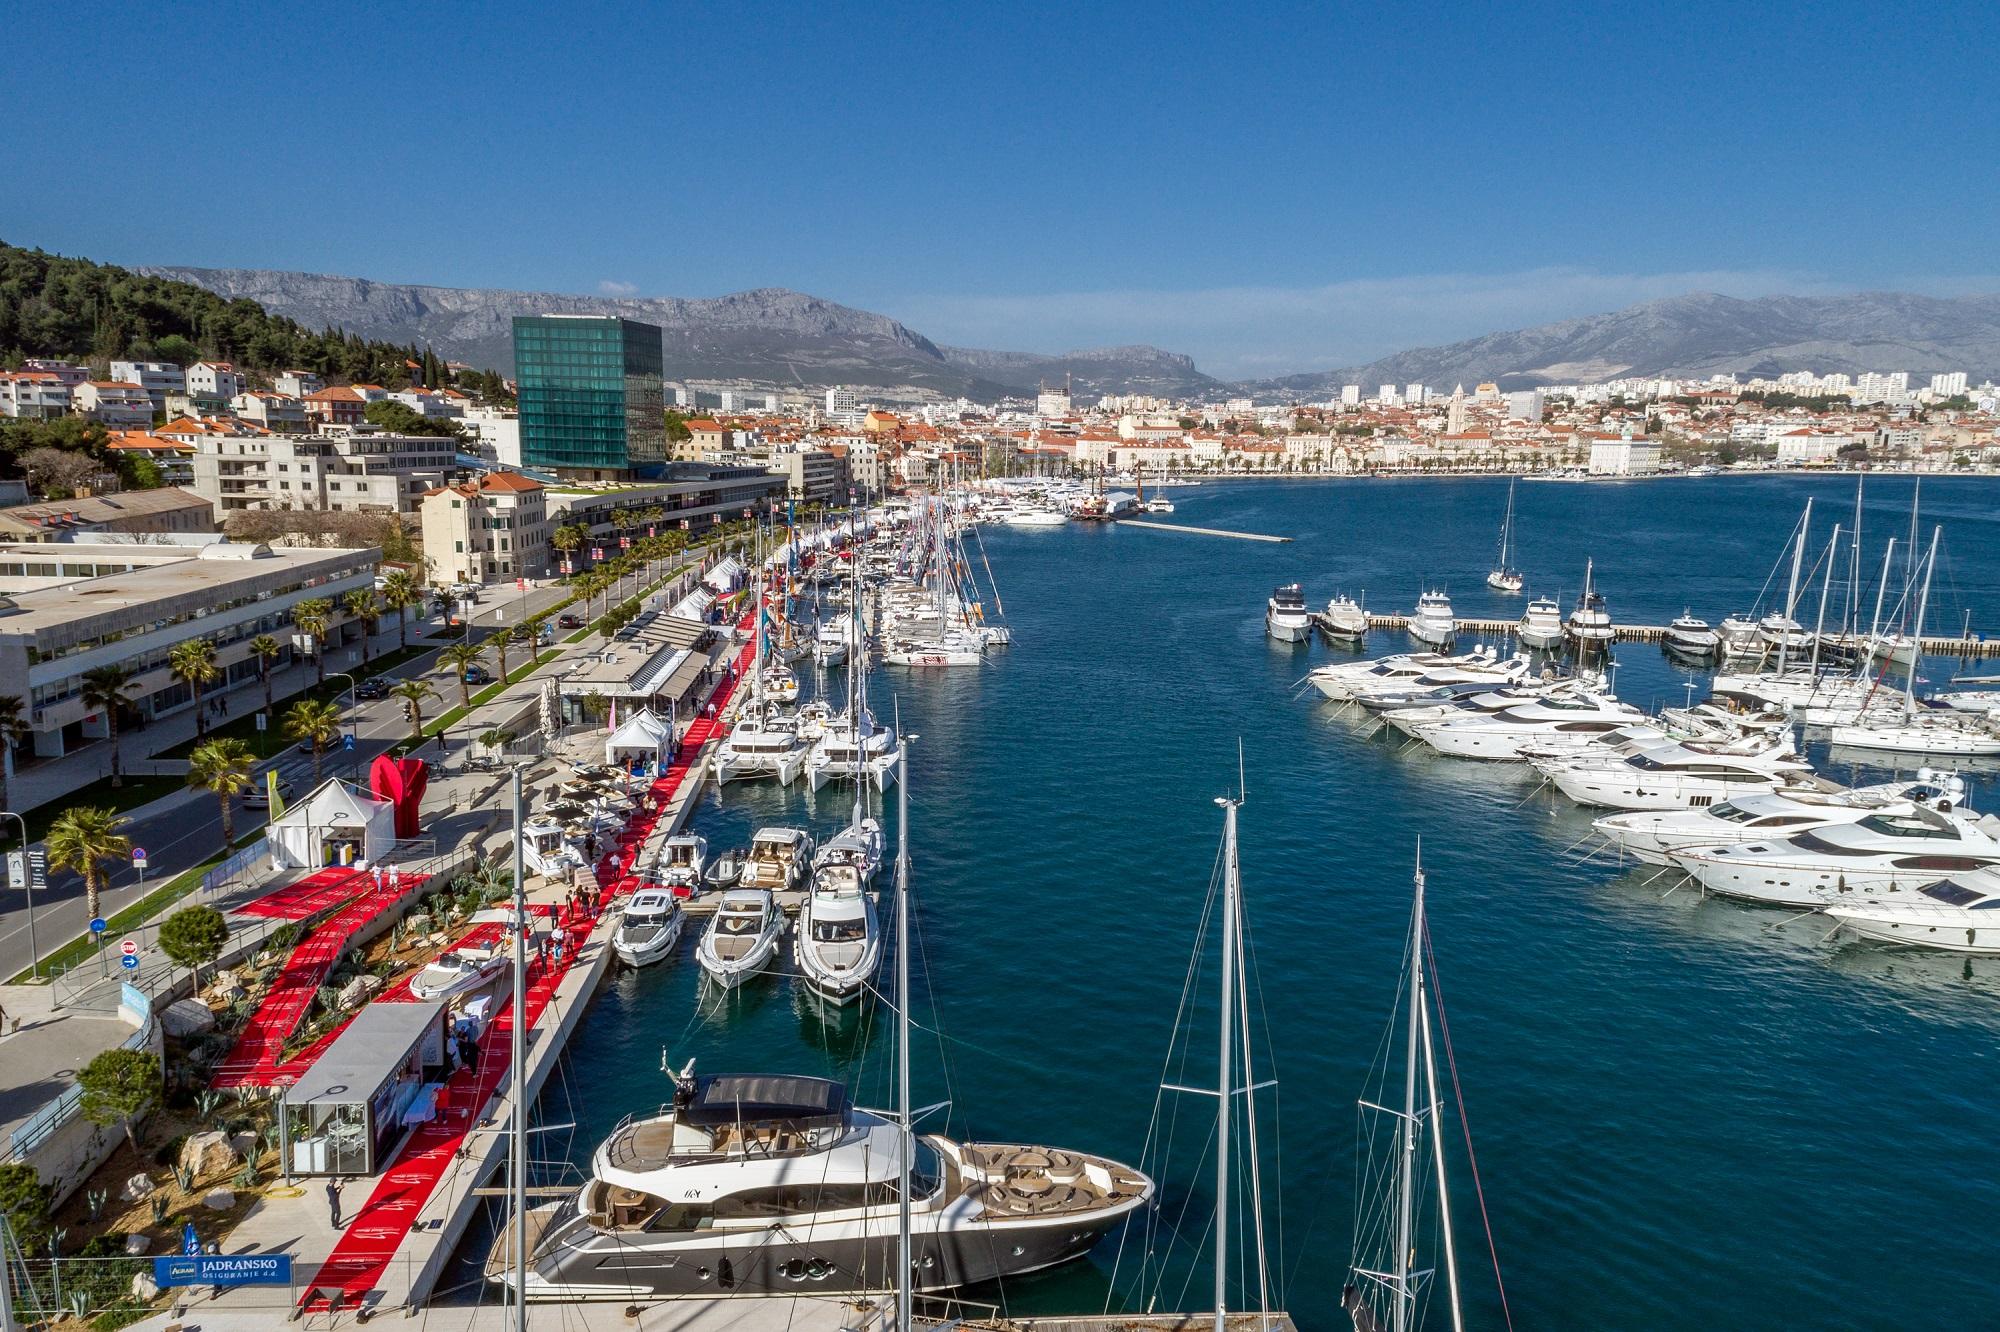 Monte Carlo Yahts Croatia at Croatia Boat Show 2018 with MCY